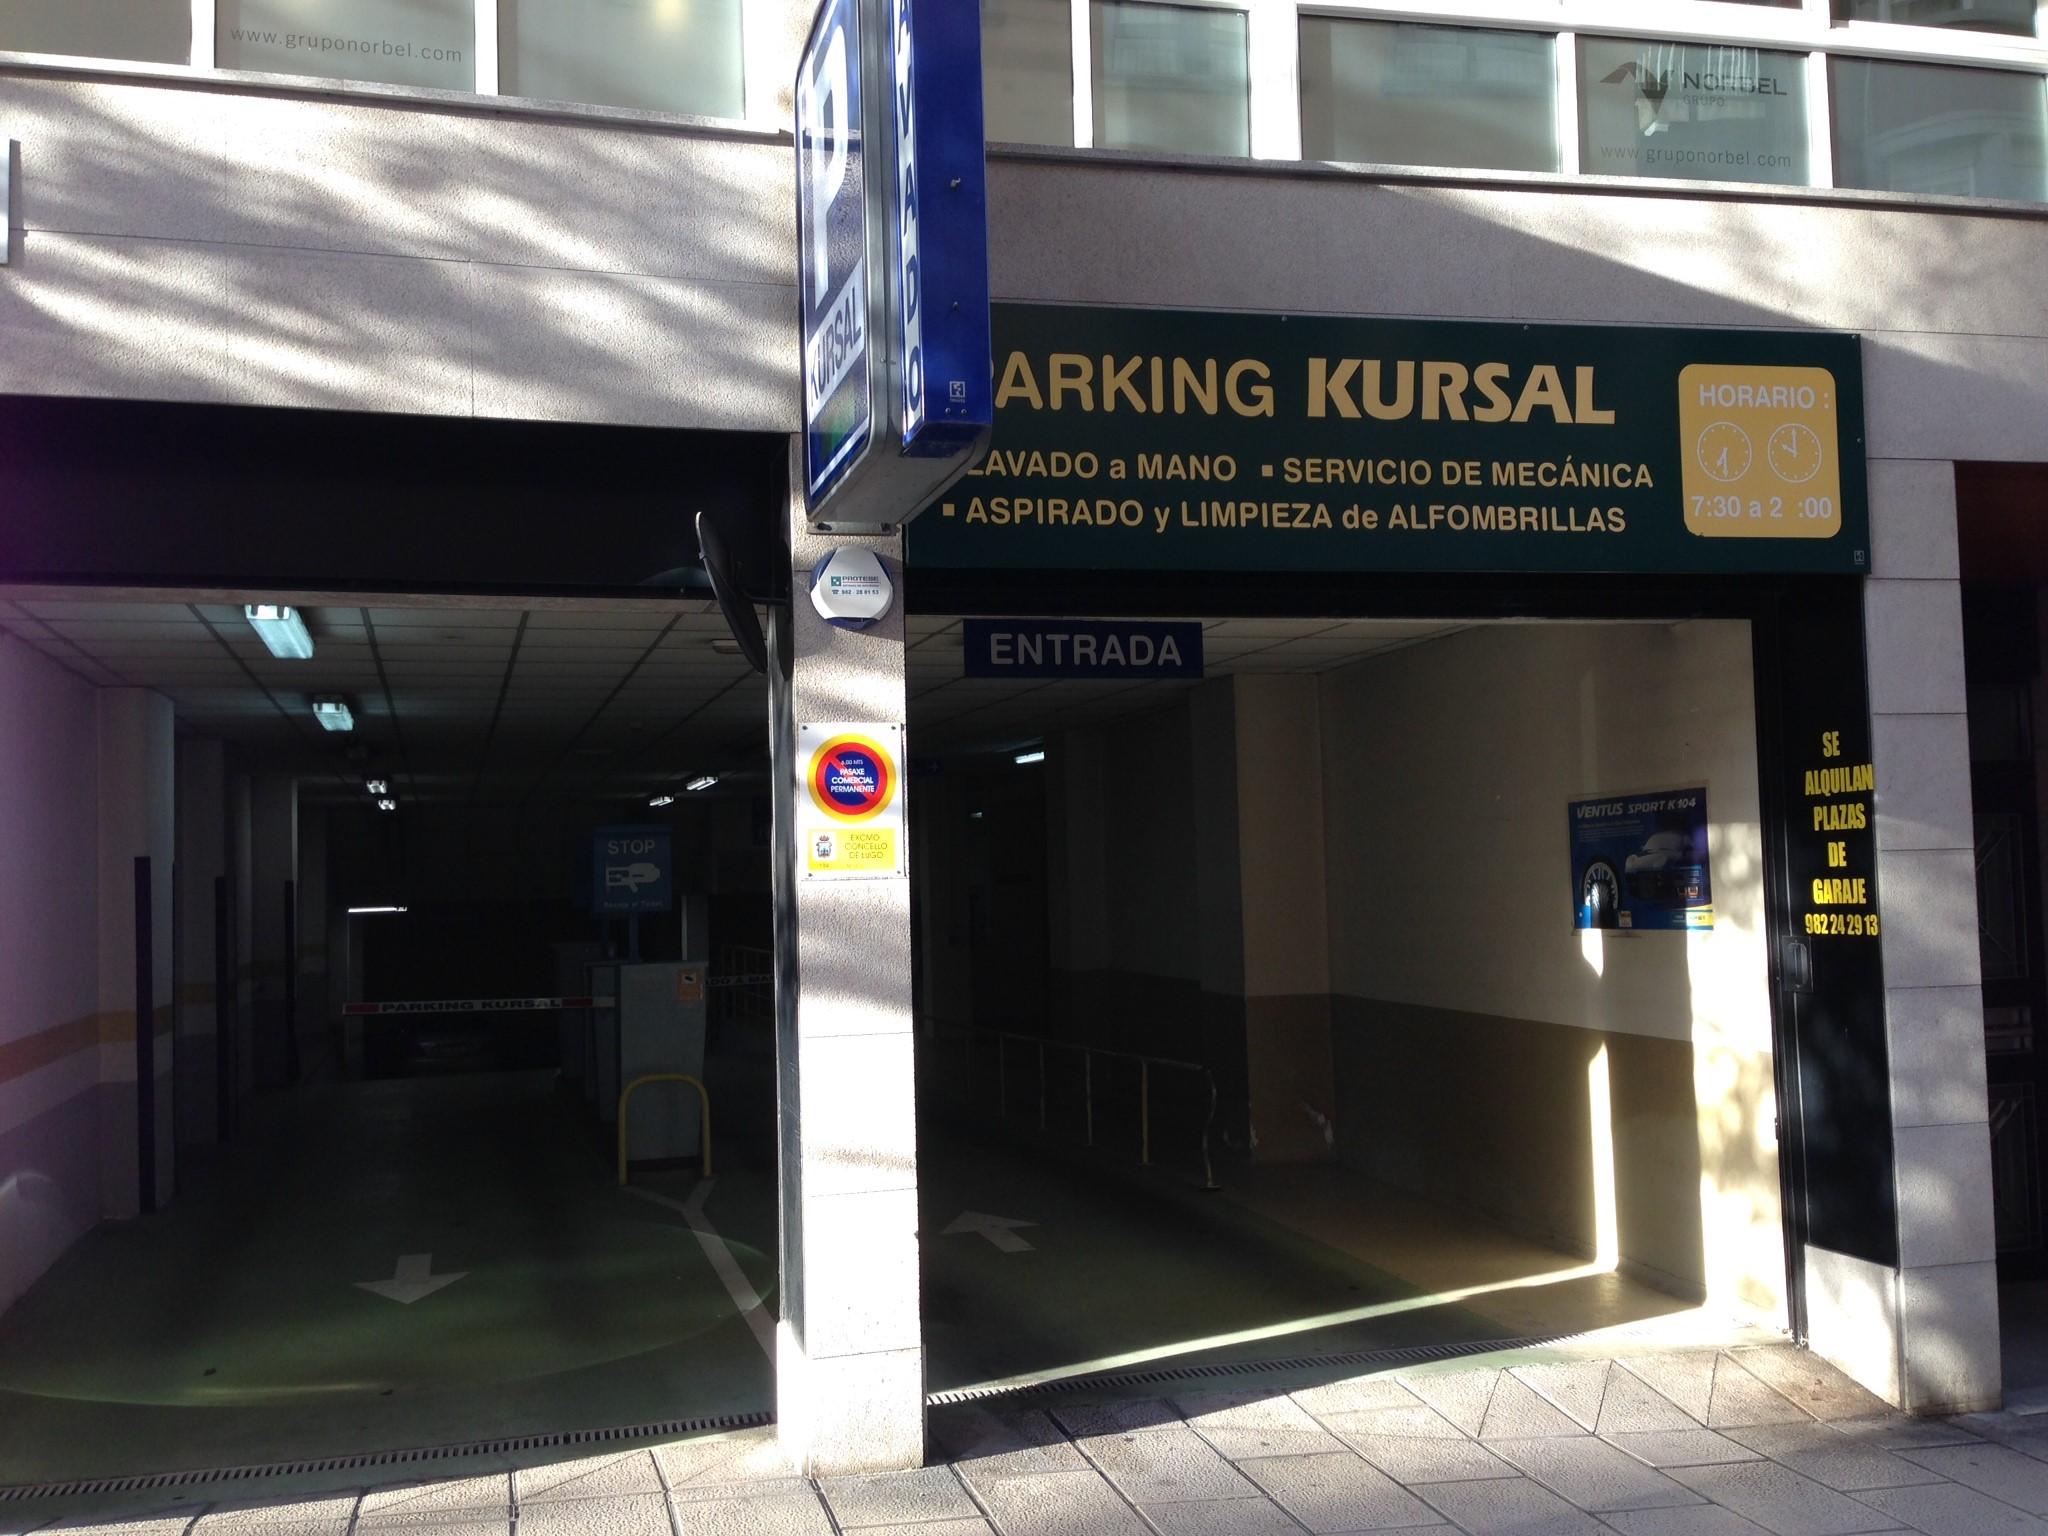 Parking Kursal